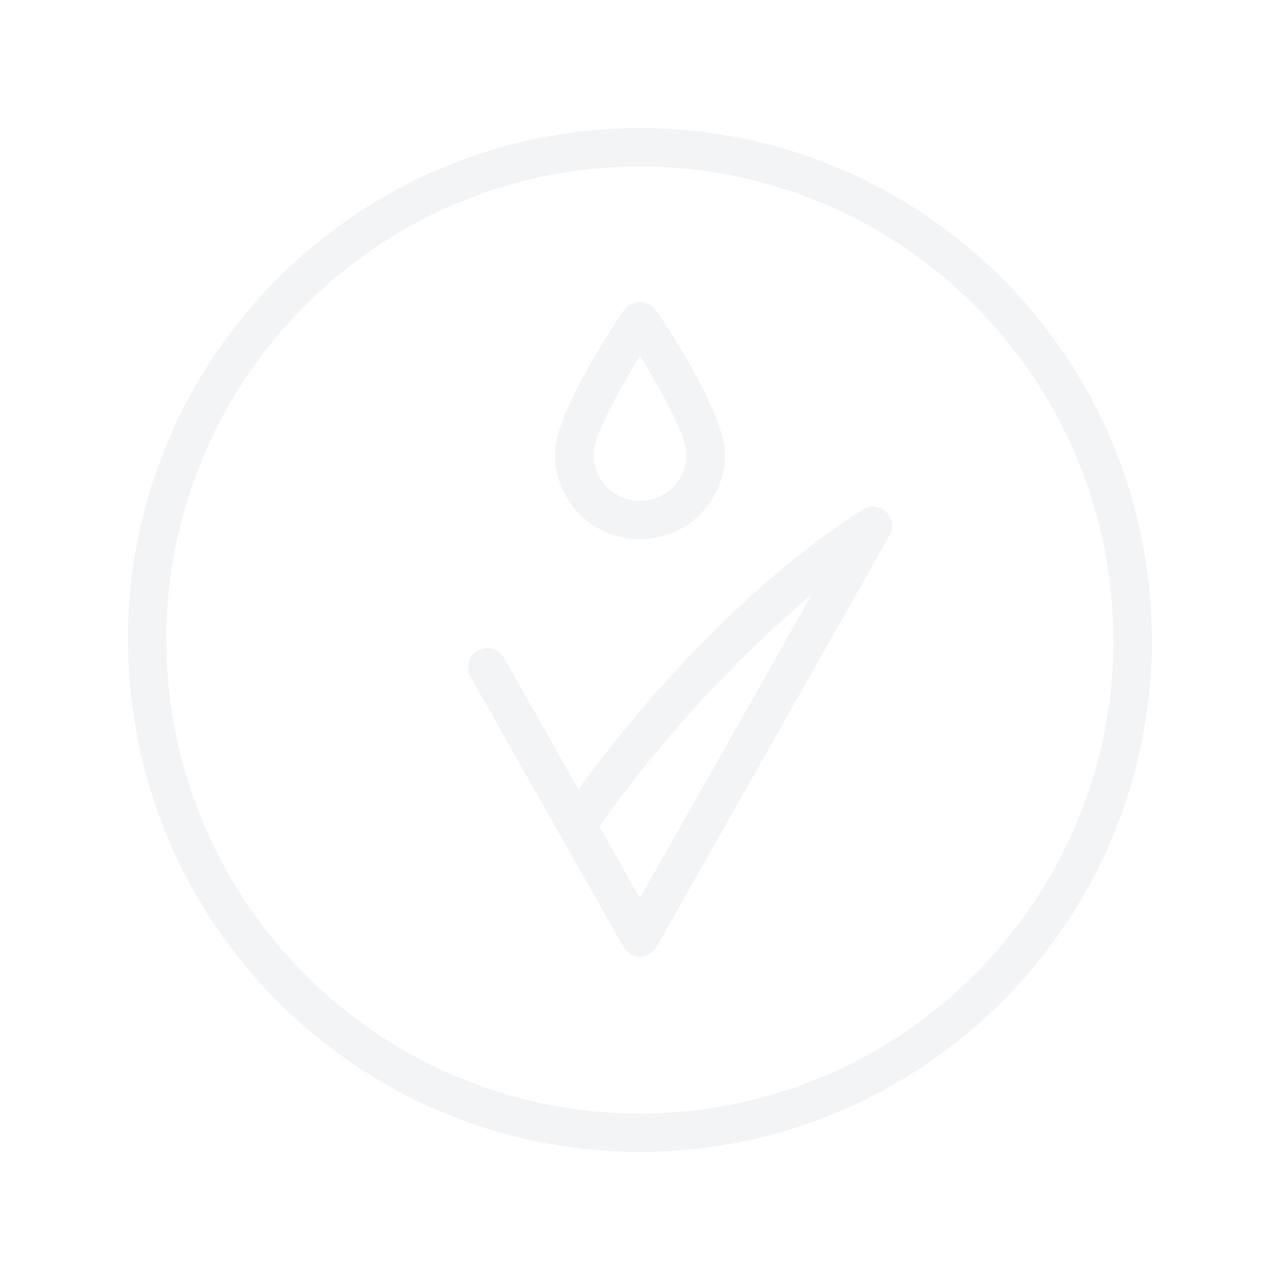 E.L.F. Makeup Remover Cleansing Cloths 20pc